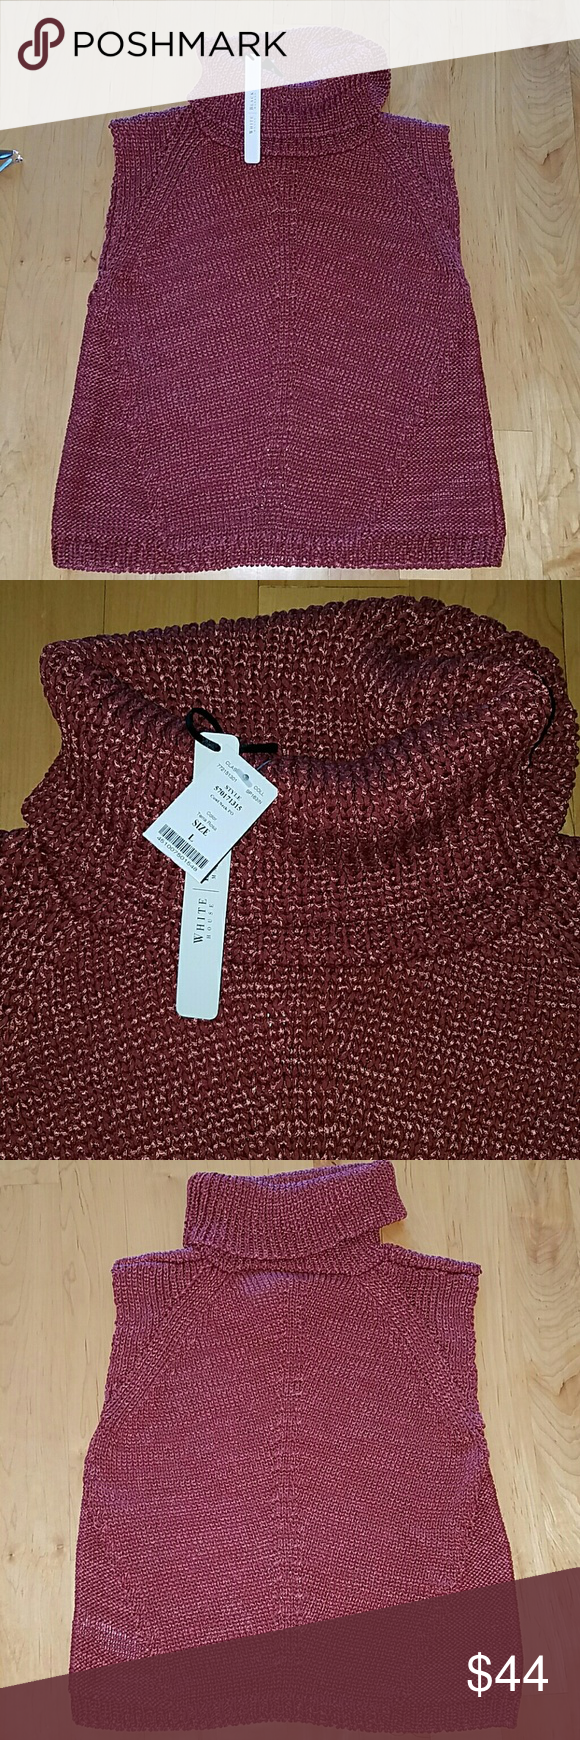 White House Black Market knit turtle neck sweater White House Black Market knit turtle neck sweater, Rust color. Size large.  NWT White House Black Market Tops